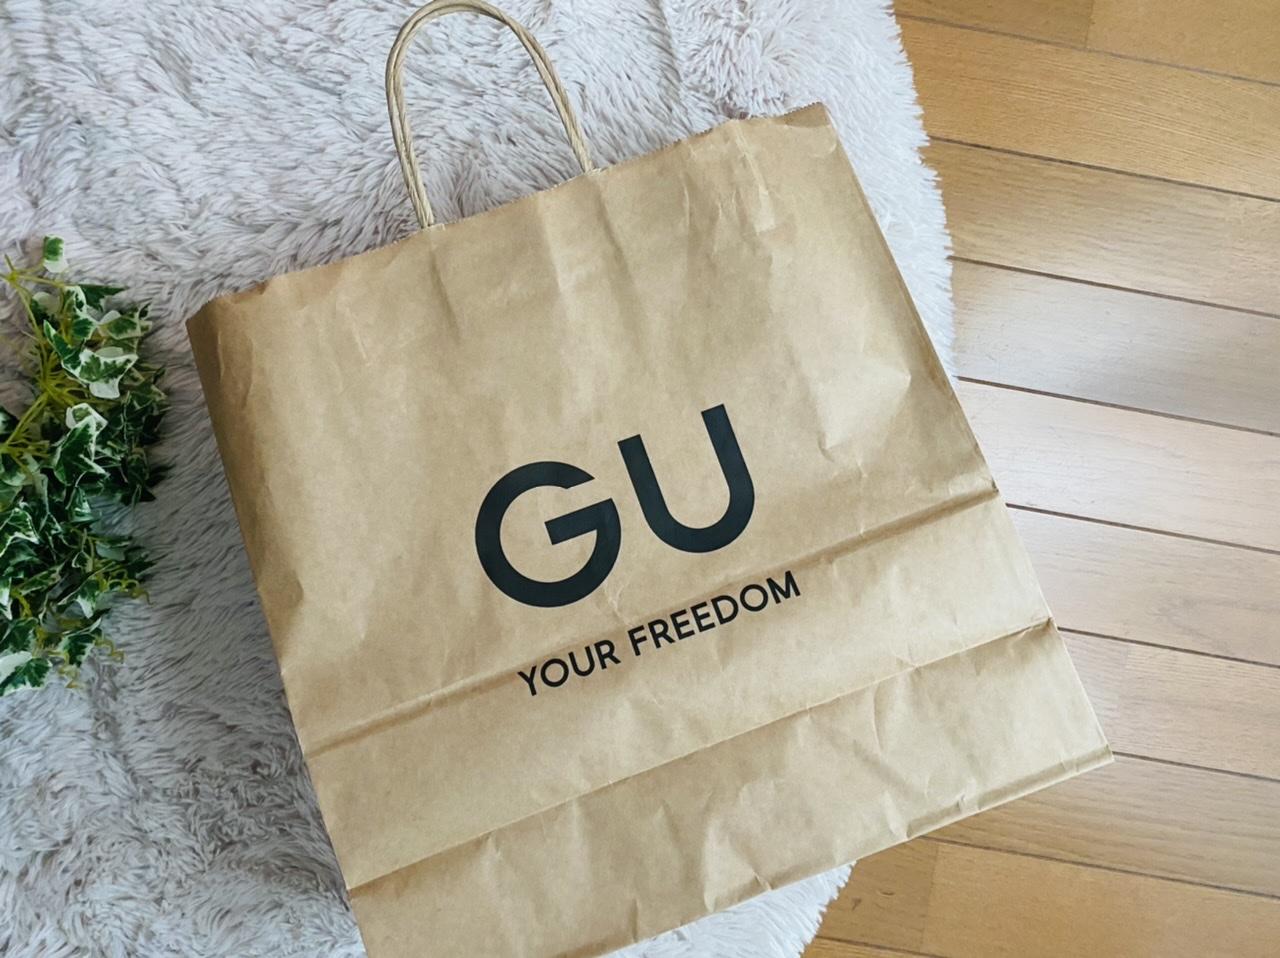 【GU初売り2021】《初売りSALE》がとにかく安い!可愛すぎてイロチ買いアイテムをご紹介★_1